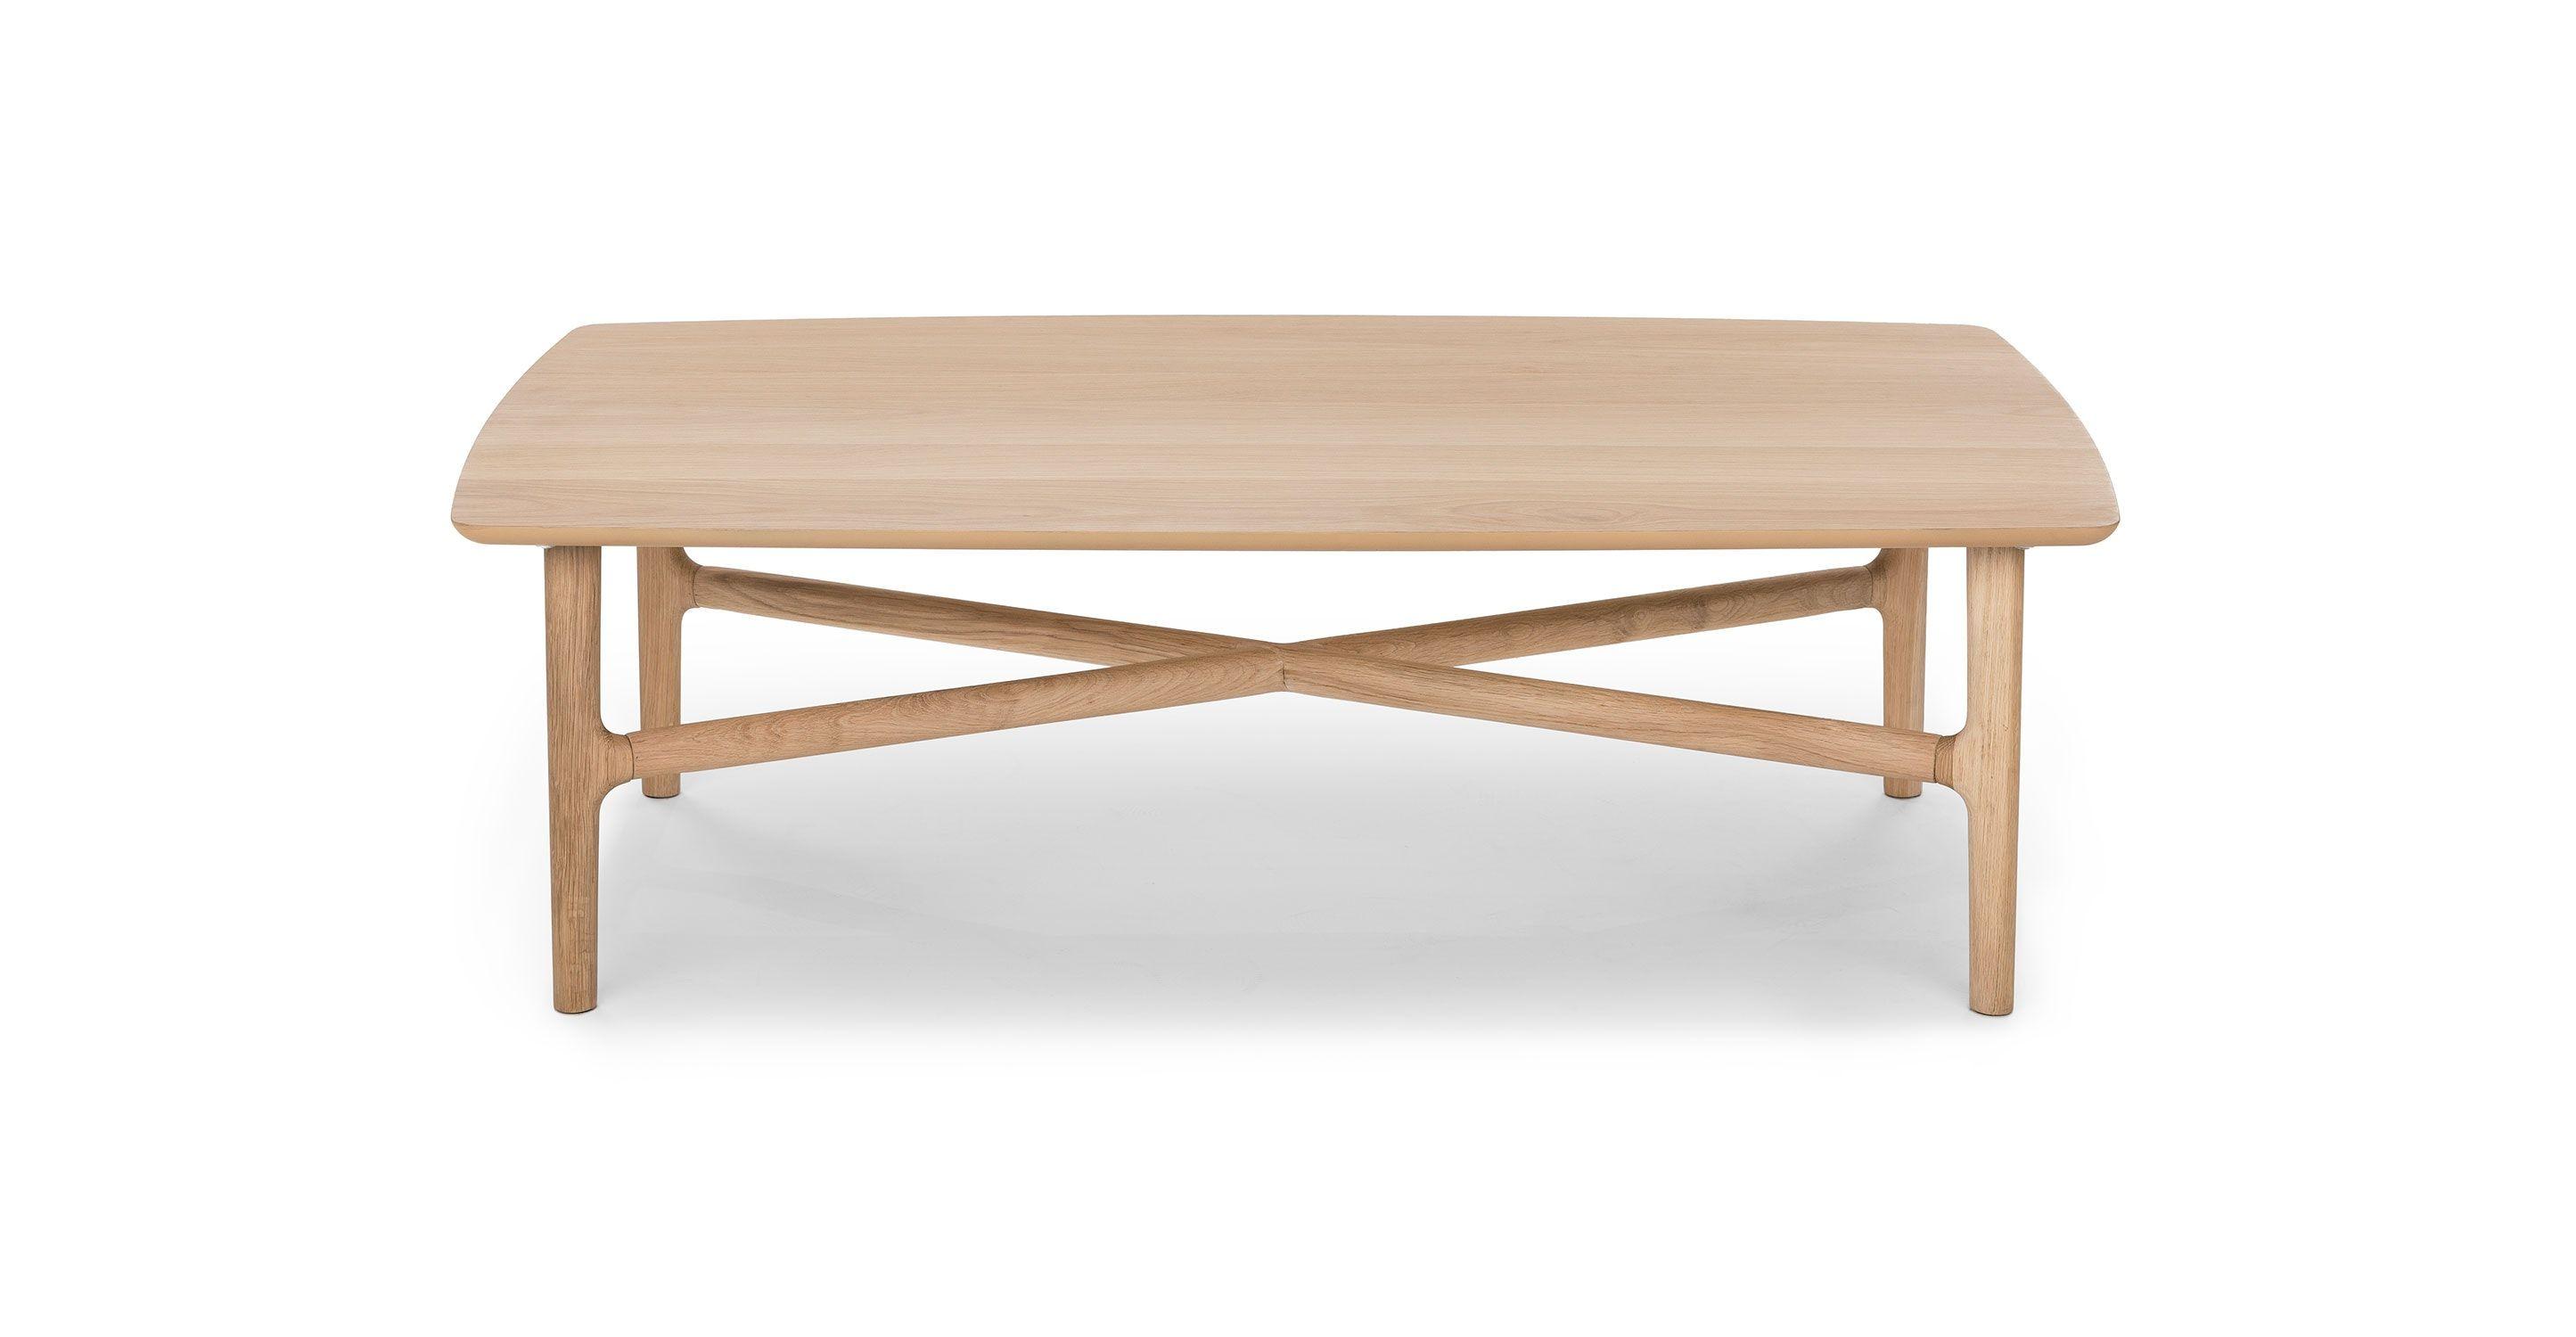 Brezza Light Oak Rectangular Coffee Table Contemporary Coffee Table Mid Century Coffee Table Oak Coffee Table [ 1500 x 2890 Pixel ]